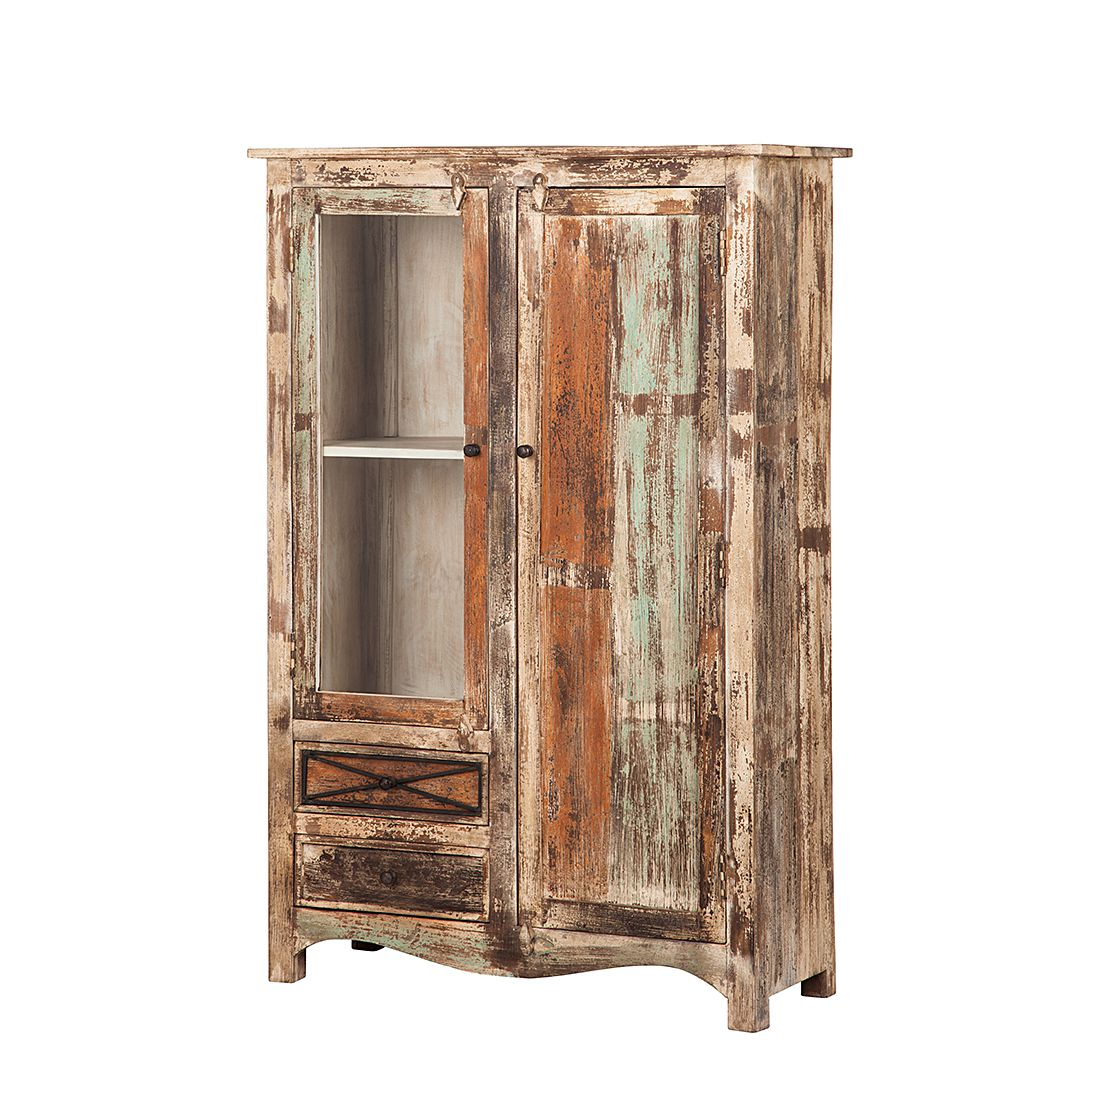 Home 24 - Armoire-vitrine india - manguier massif verni - 2 portes, ars natura